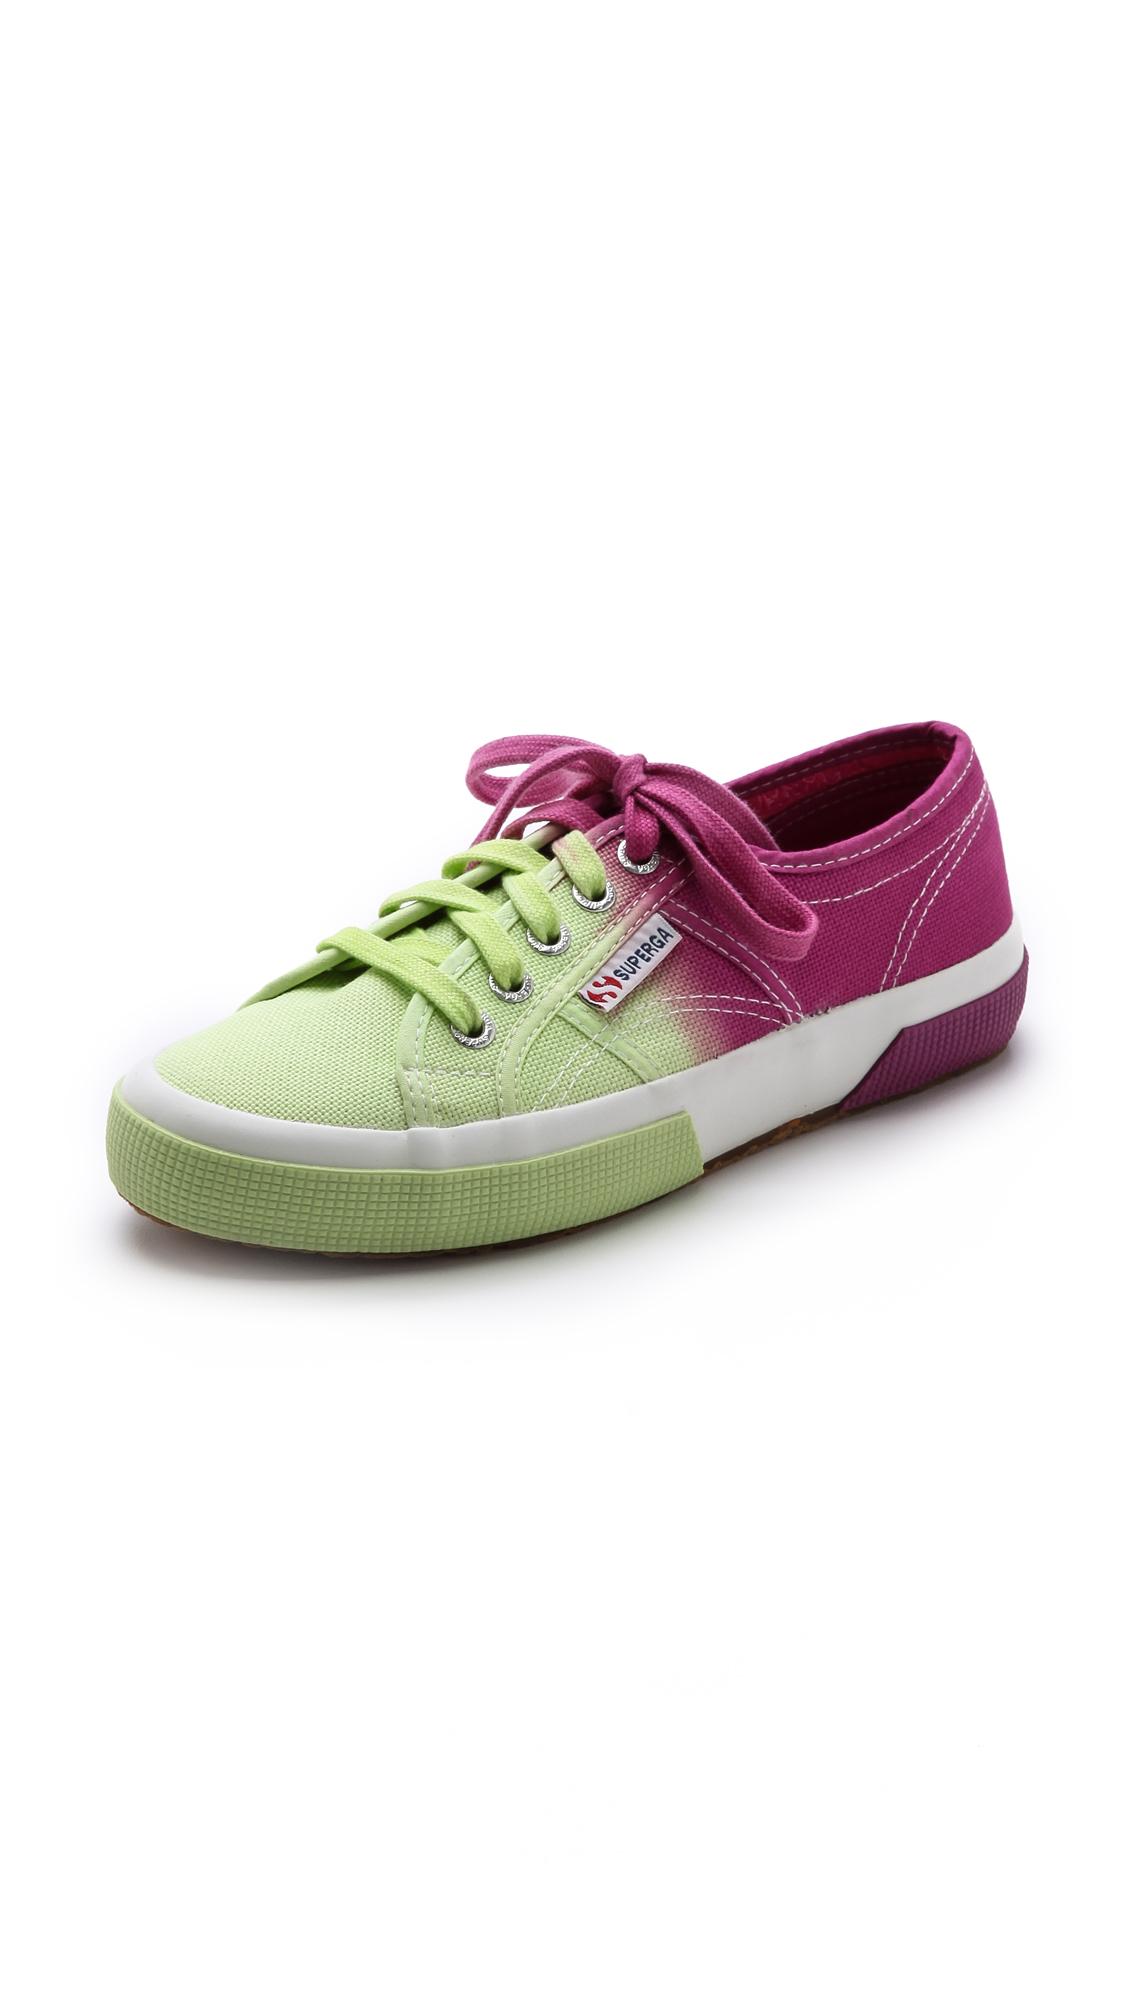 Superga: Superga Ombre Sneakers In Green (Yellow Multi)